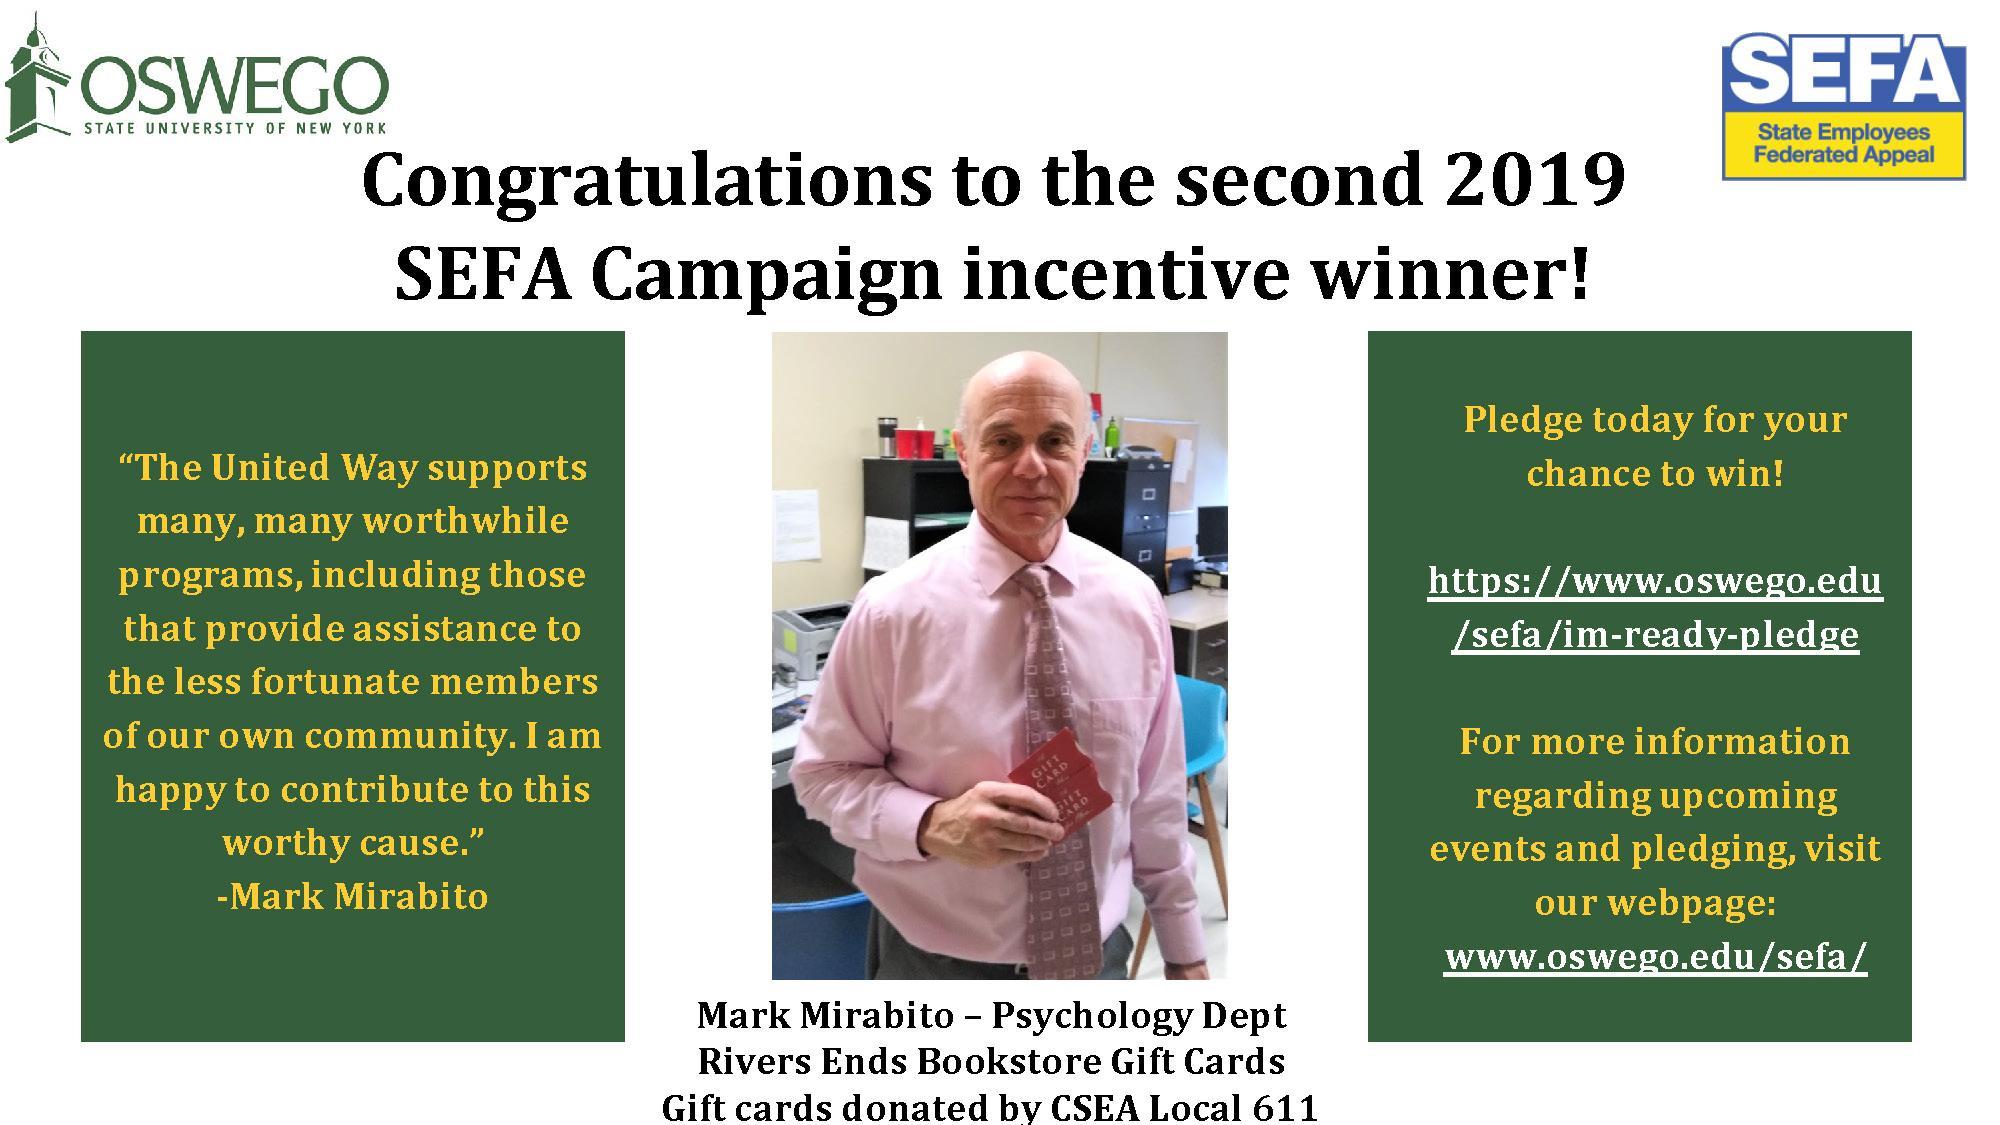 Mark Mirabito - Winner of Incentive Bi-Monthly Prize #2